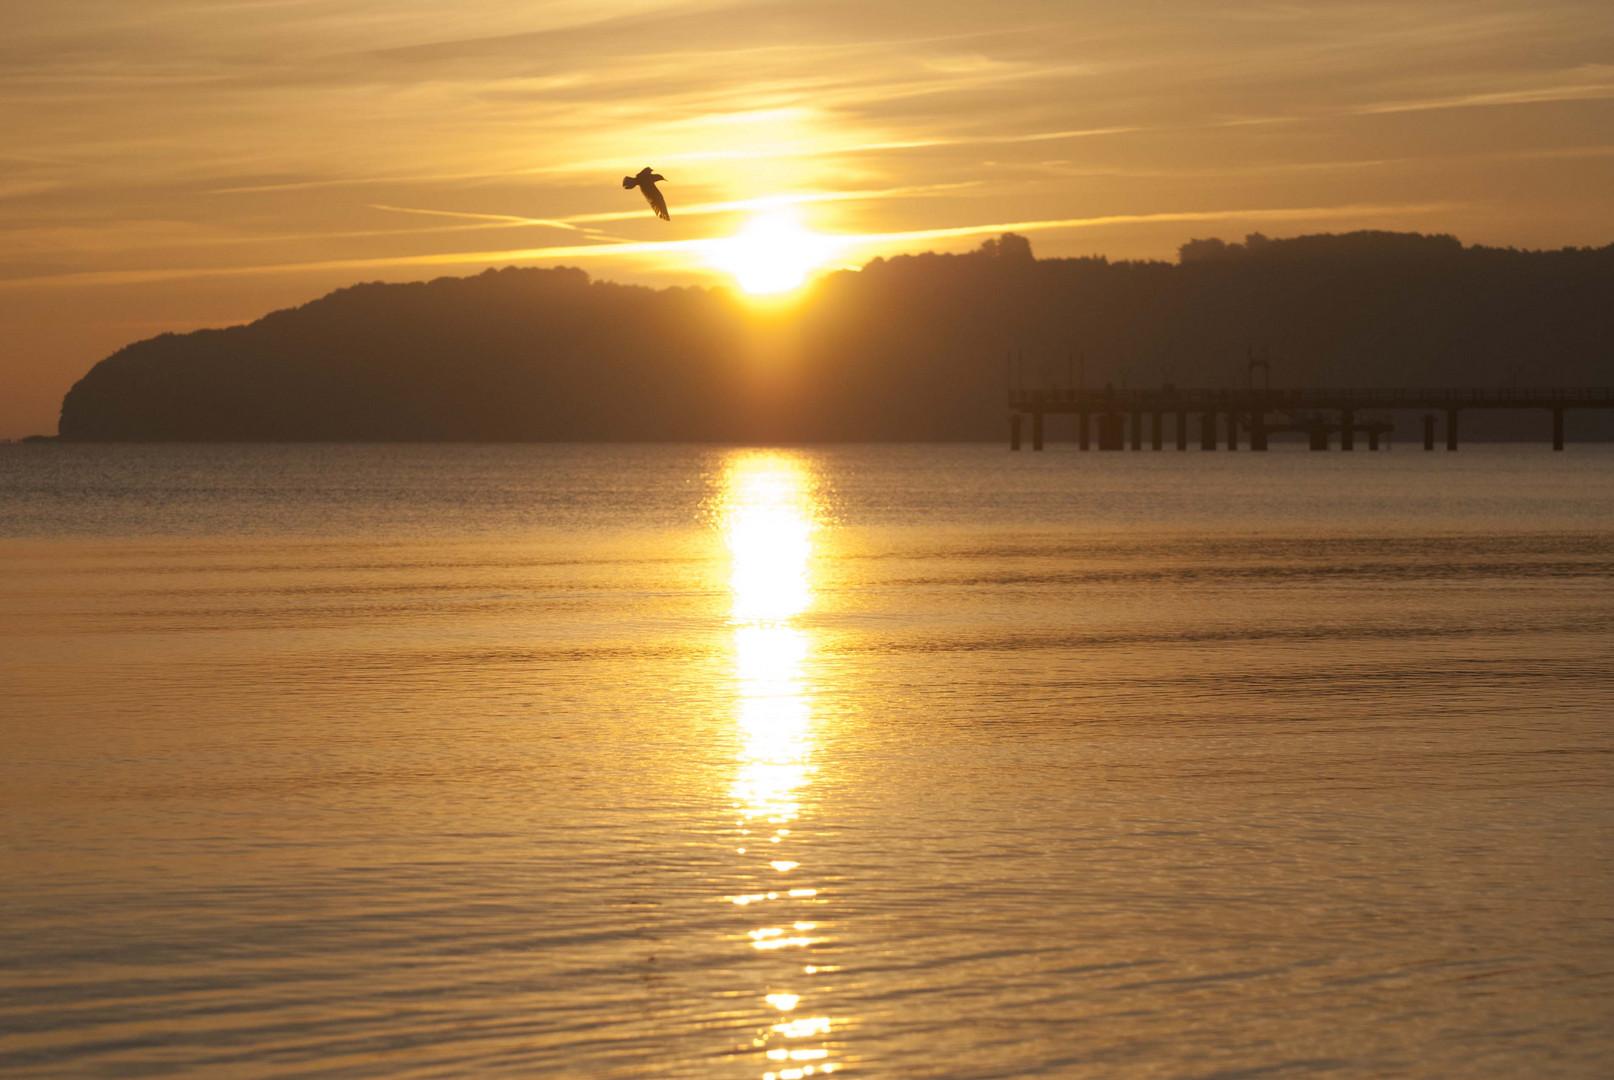 Sonnenaufgang in Binz bei der Seebrücke